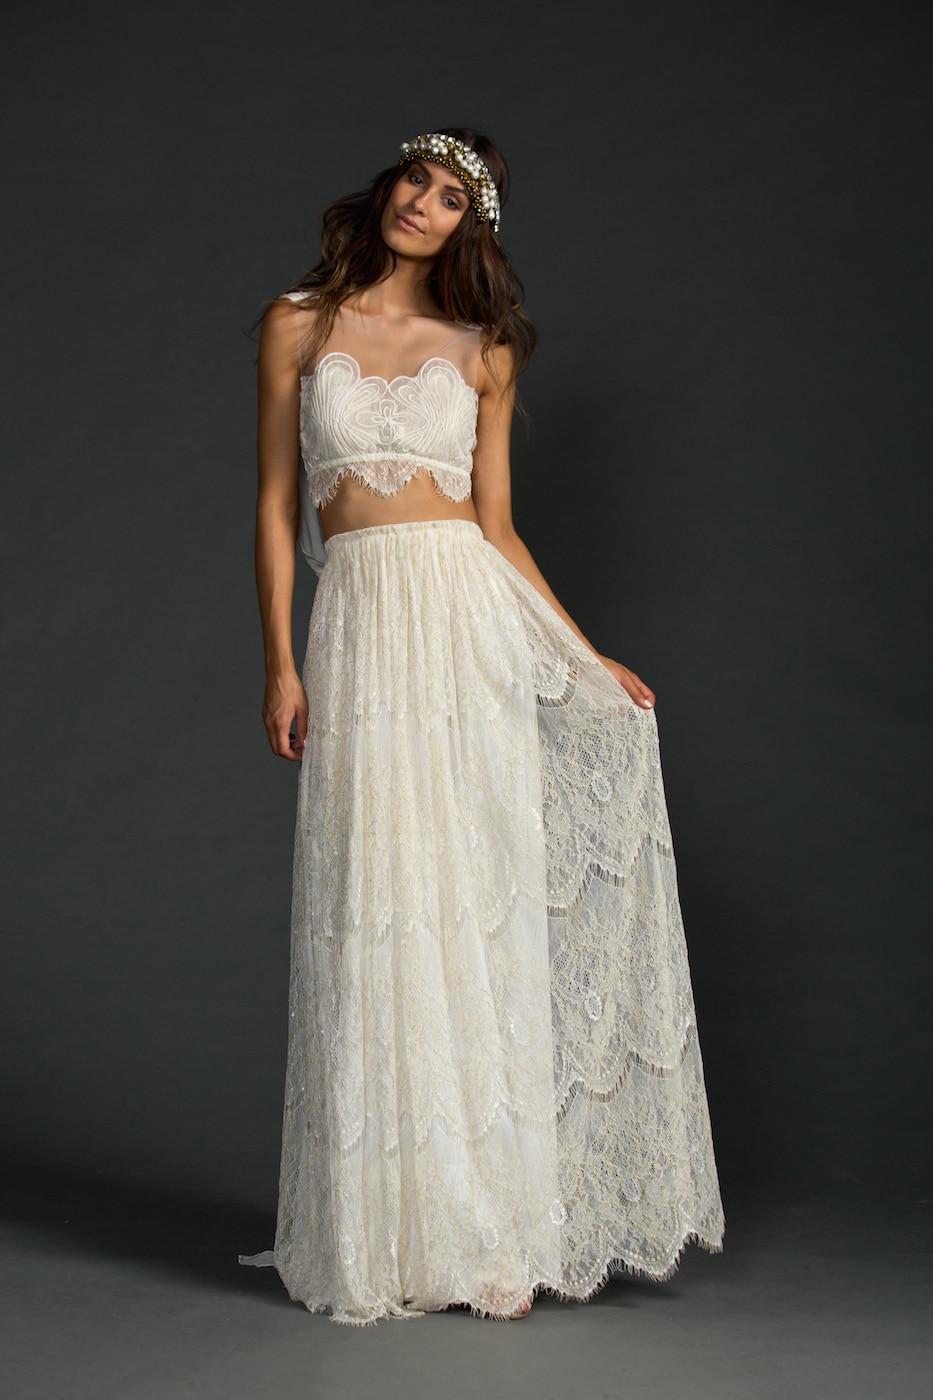 long wedding reception dresses for the bride reception wedding dresses Long Wedding Reception Dresses For The Bride 99